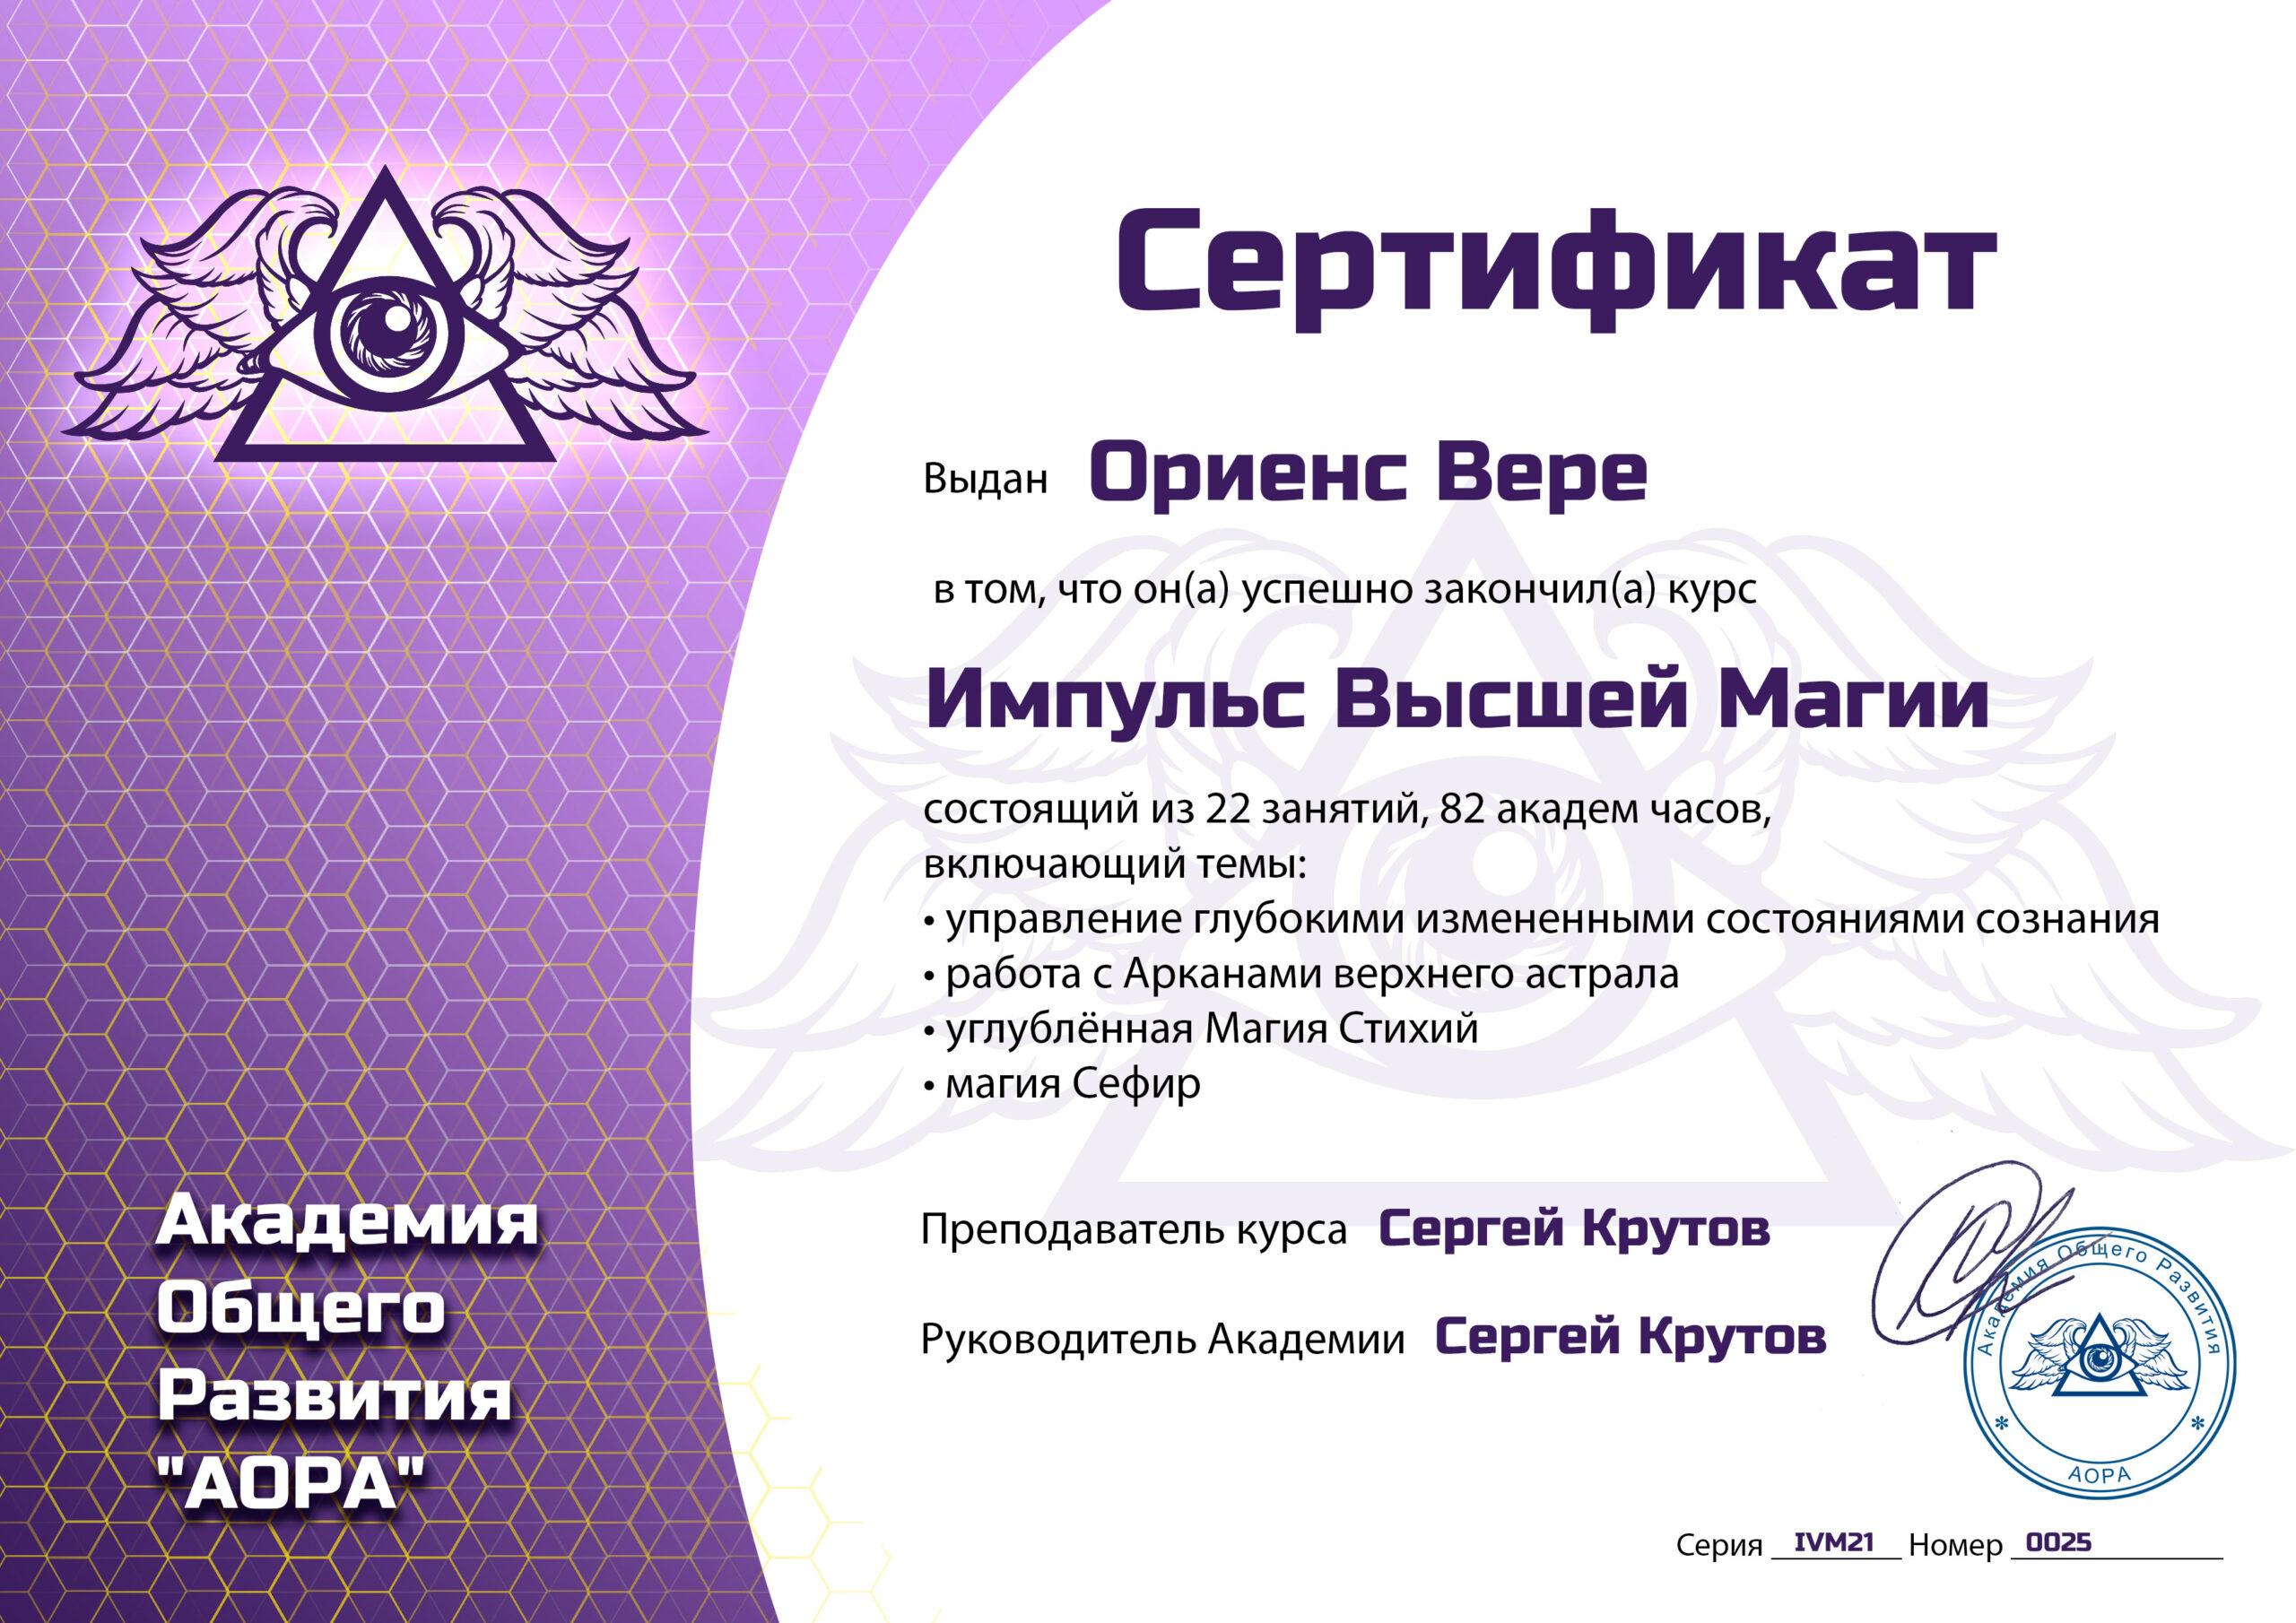 Сертификат ИВМ Ориенс